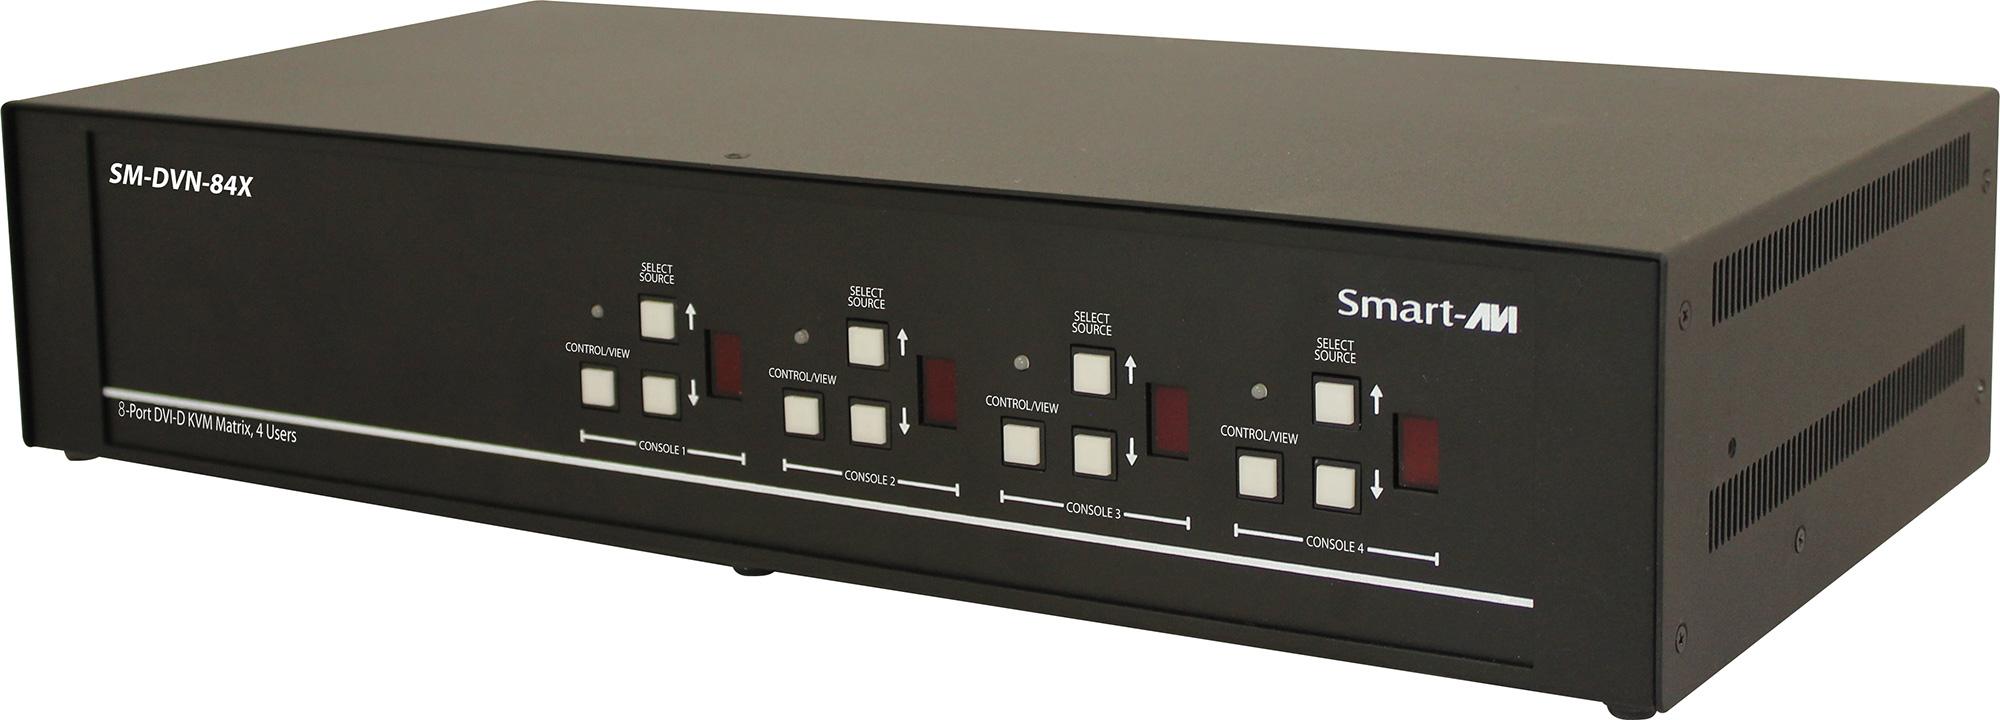 Smart AVI SM-DVN-84X DVI-D Matrix KVM Switch with Audio and USB 2.0 Support (4 Users) - 8 Port SAVI-SM-DVN-84X